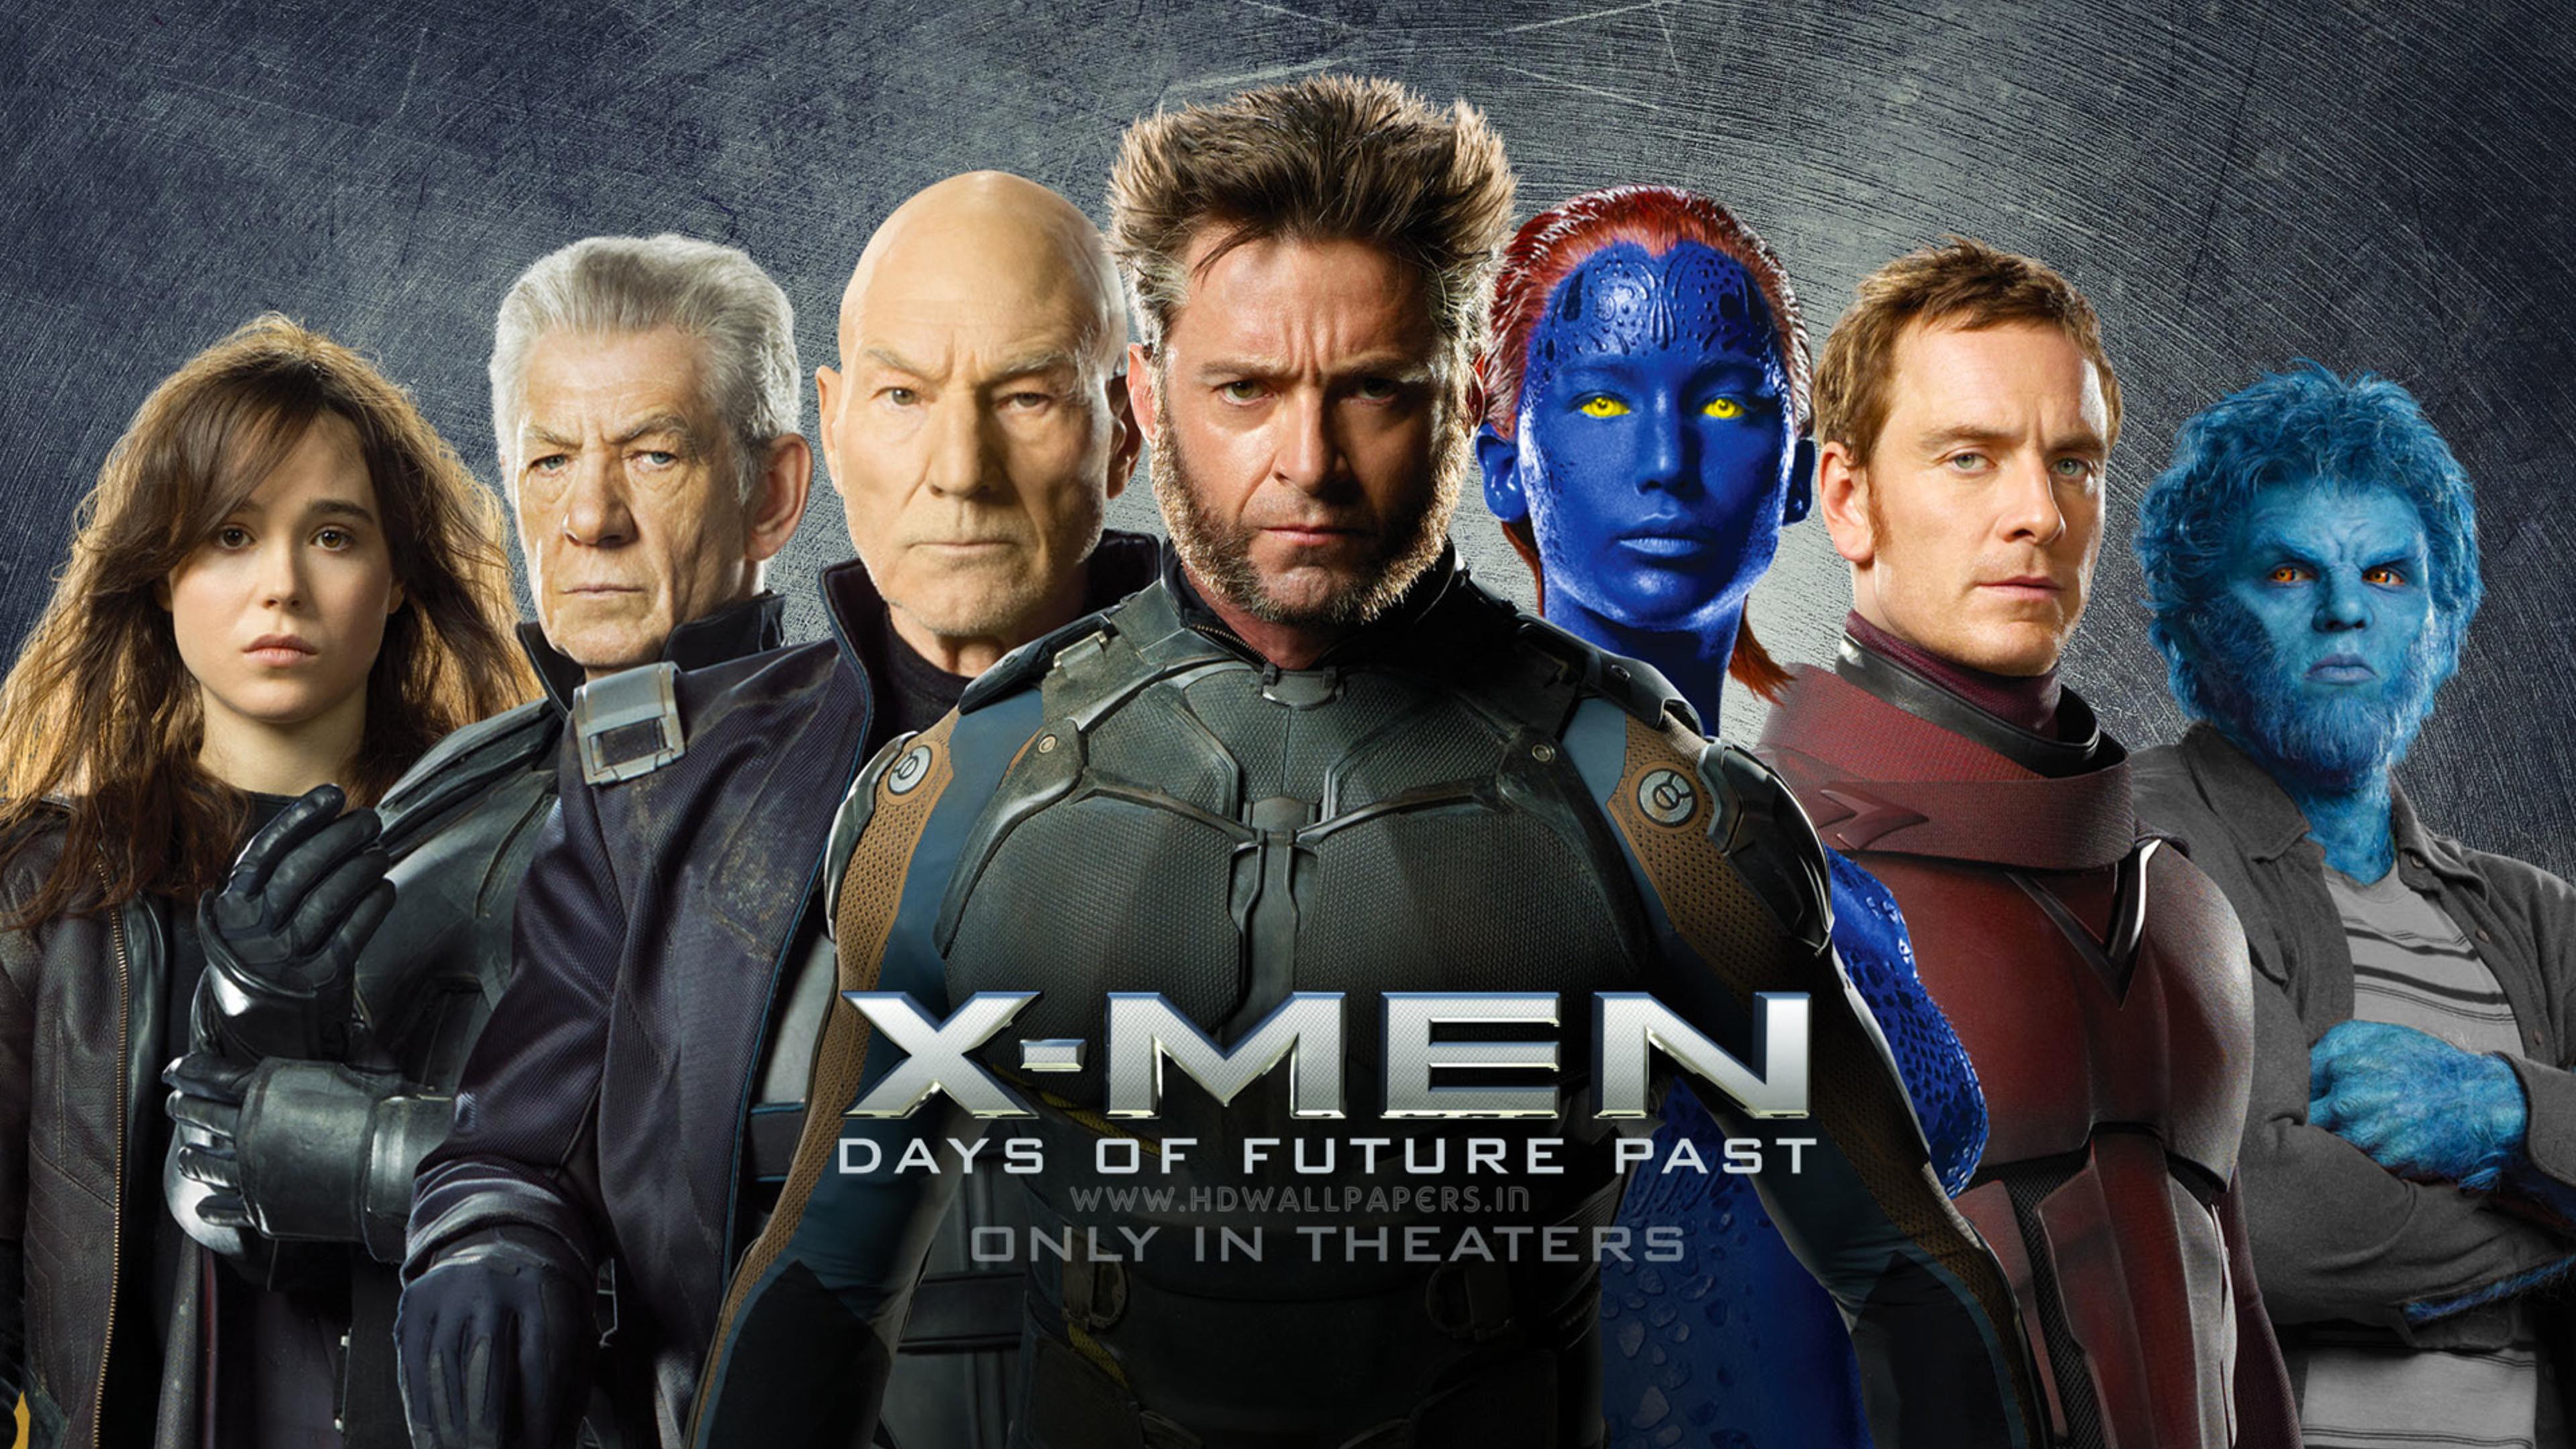 Wallpaper 4k X Men Days Of Future Past movies wallpapers x men 3840x2160